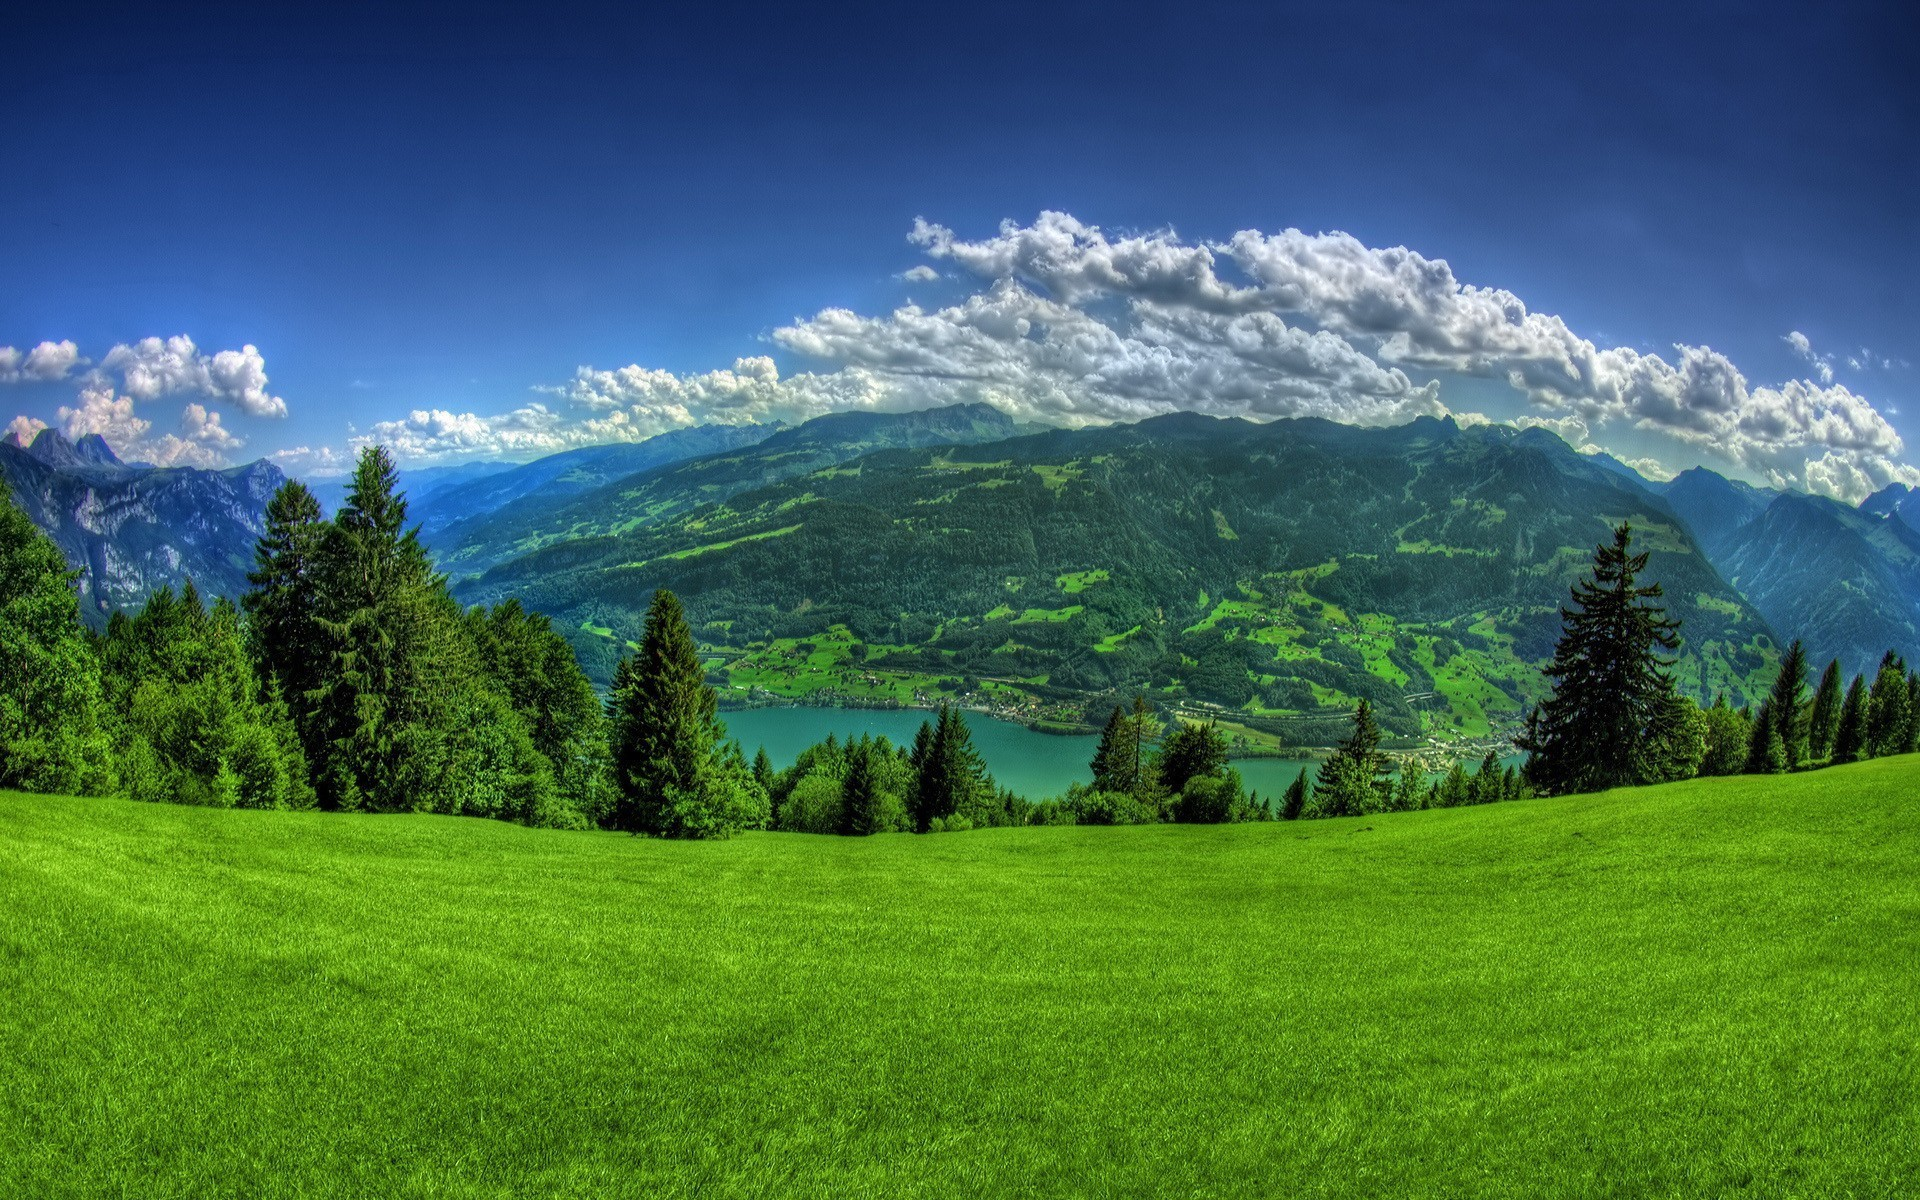 design 美丽风景图呼伦贝尔风景图自然风景图唯美风景  壁纸桌面草原